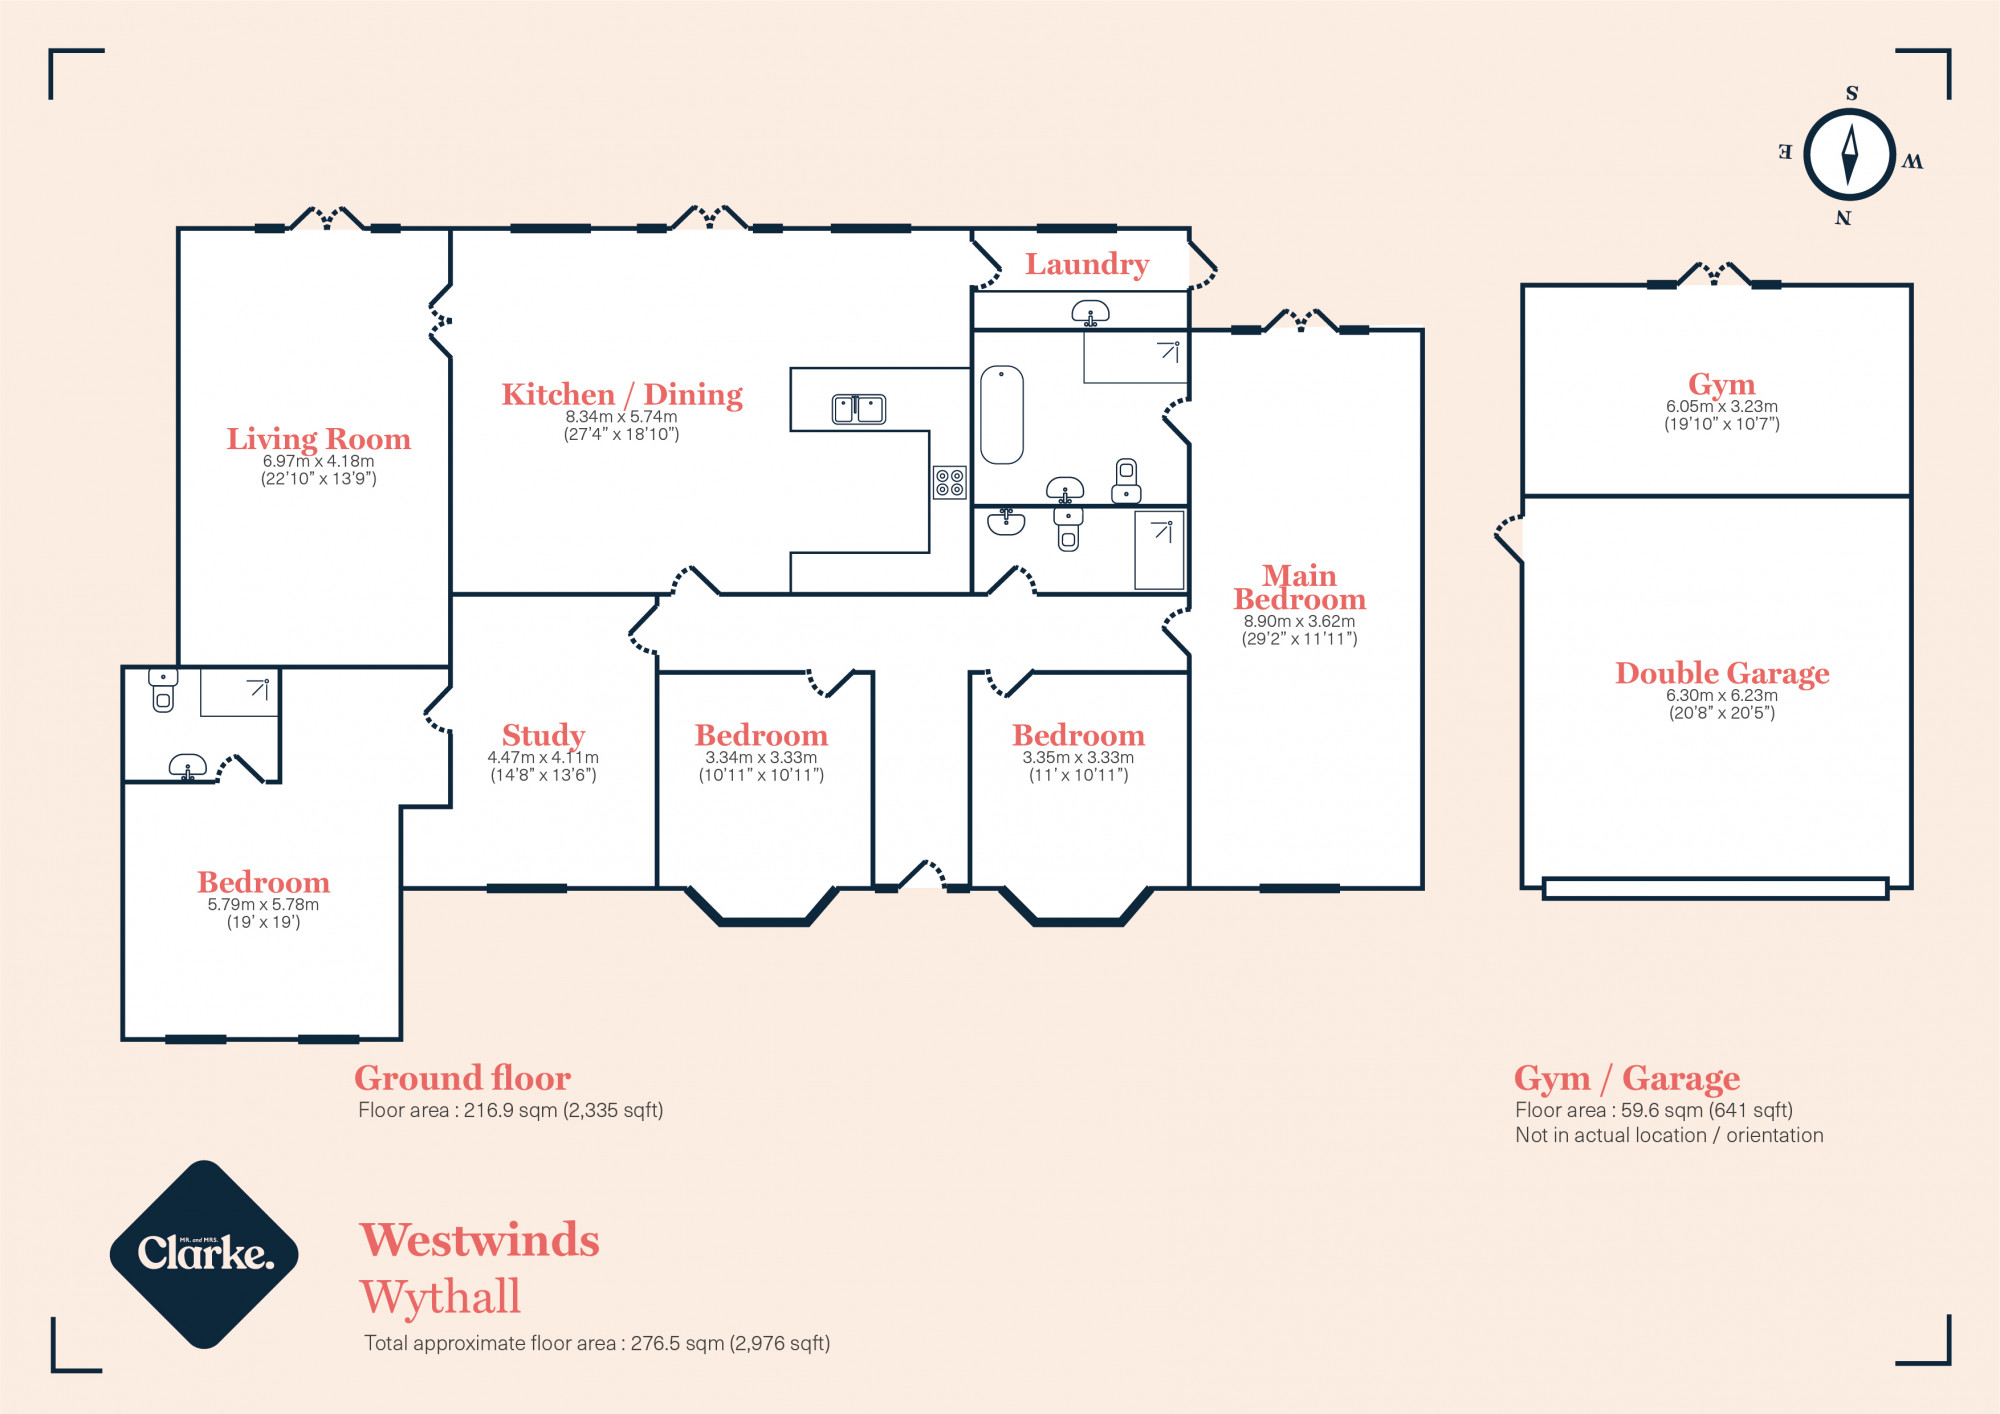 Westwinds, Wythall. Floorplan.